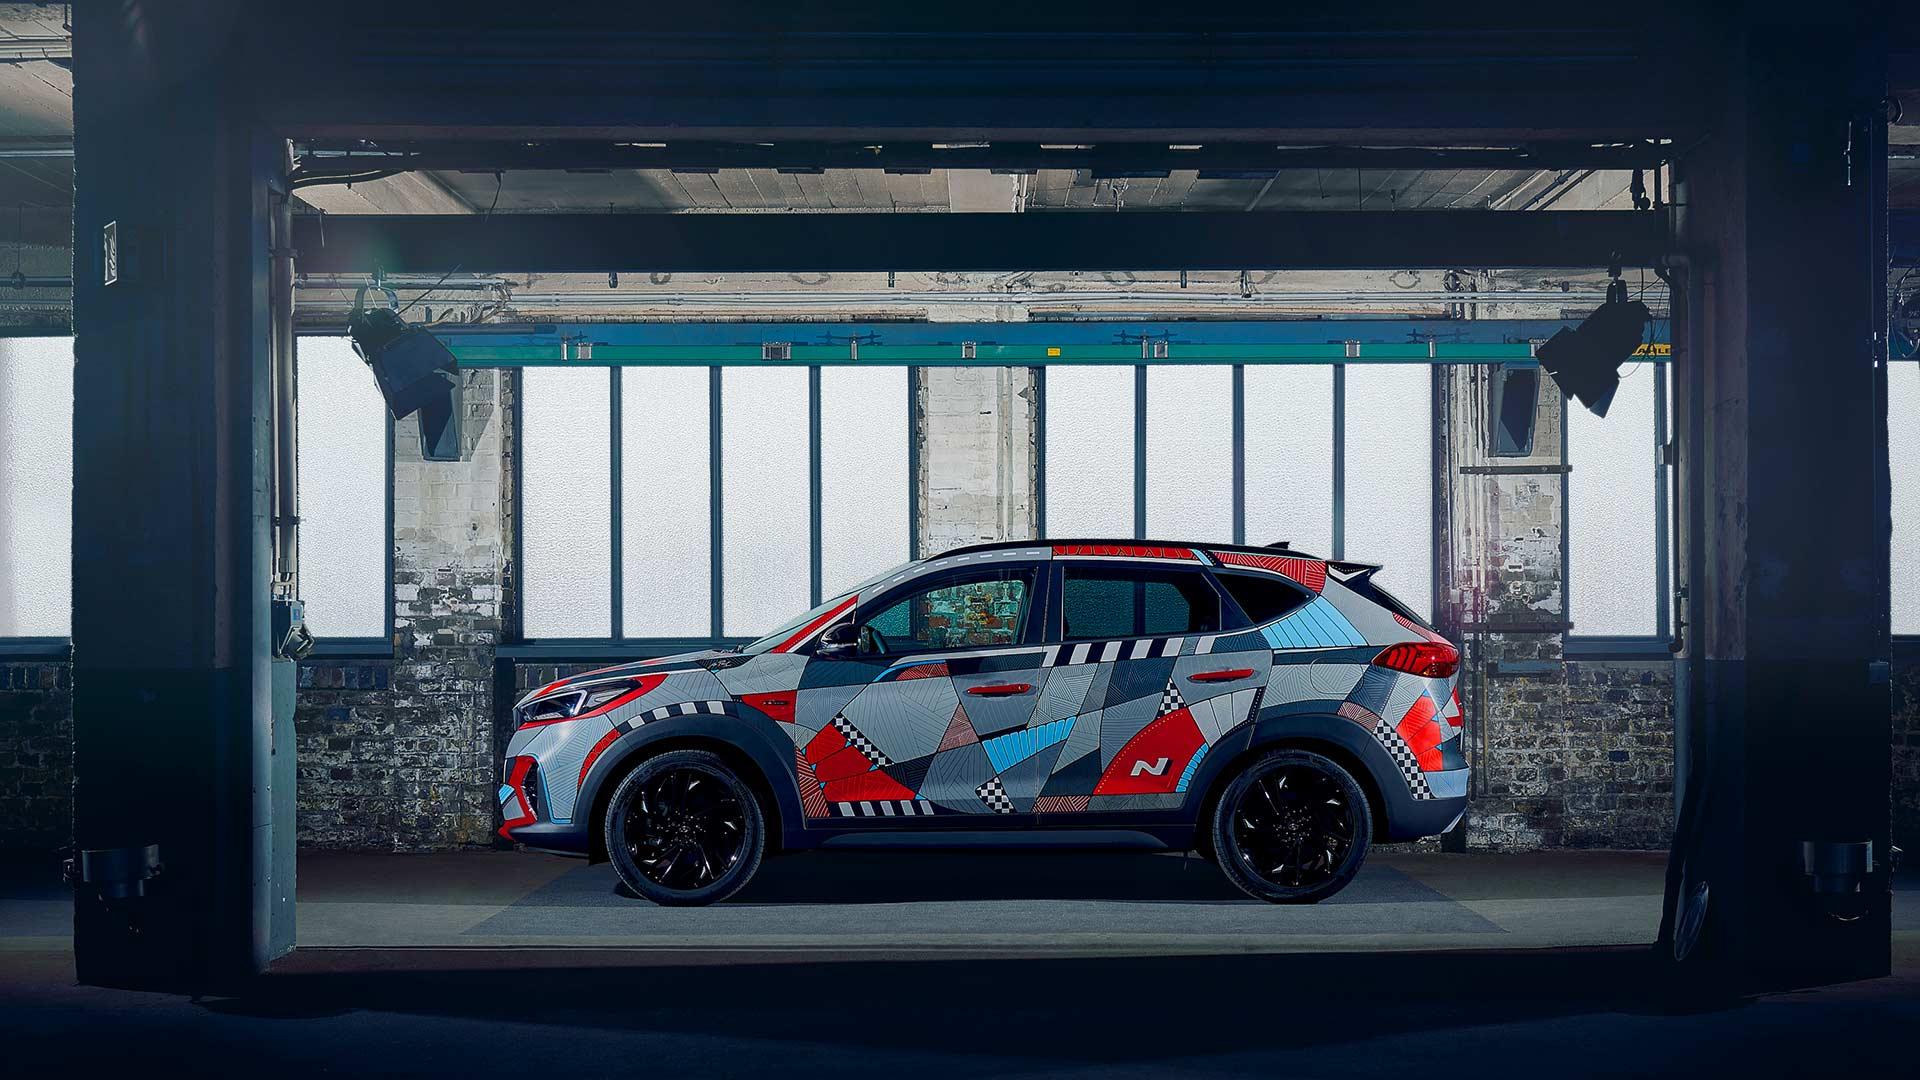 2019 Hyundai Tucson N Line Project Art Car